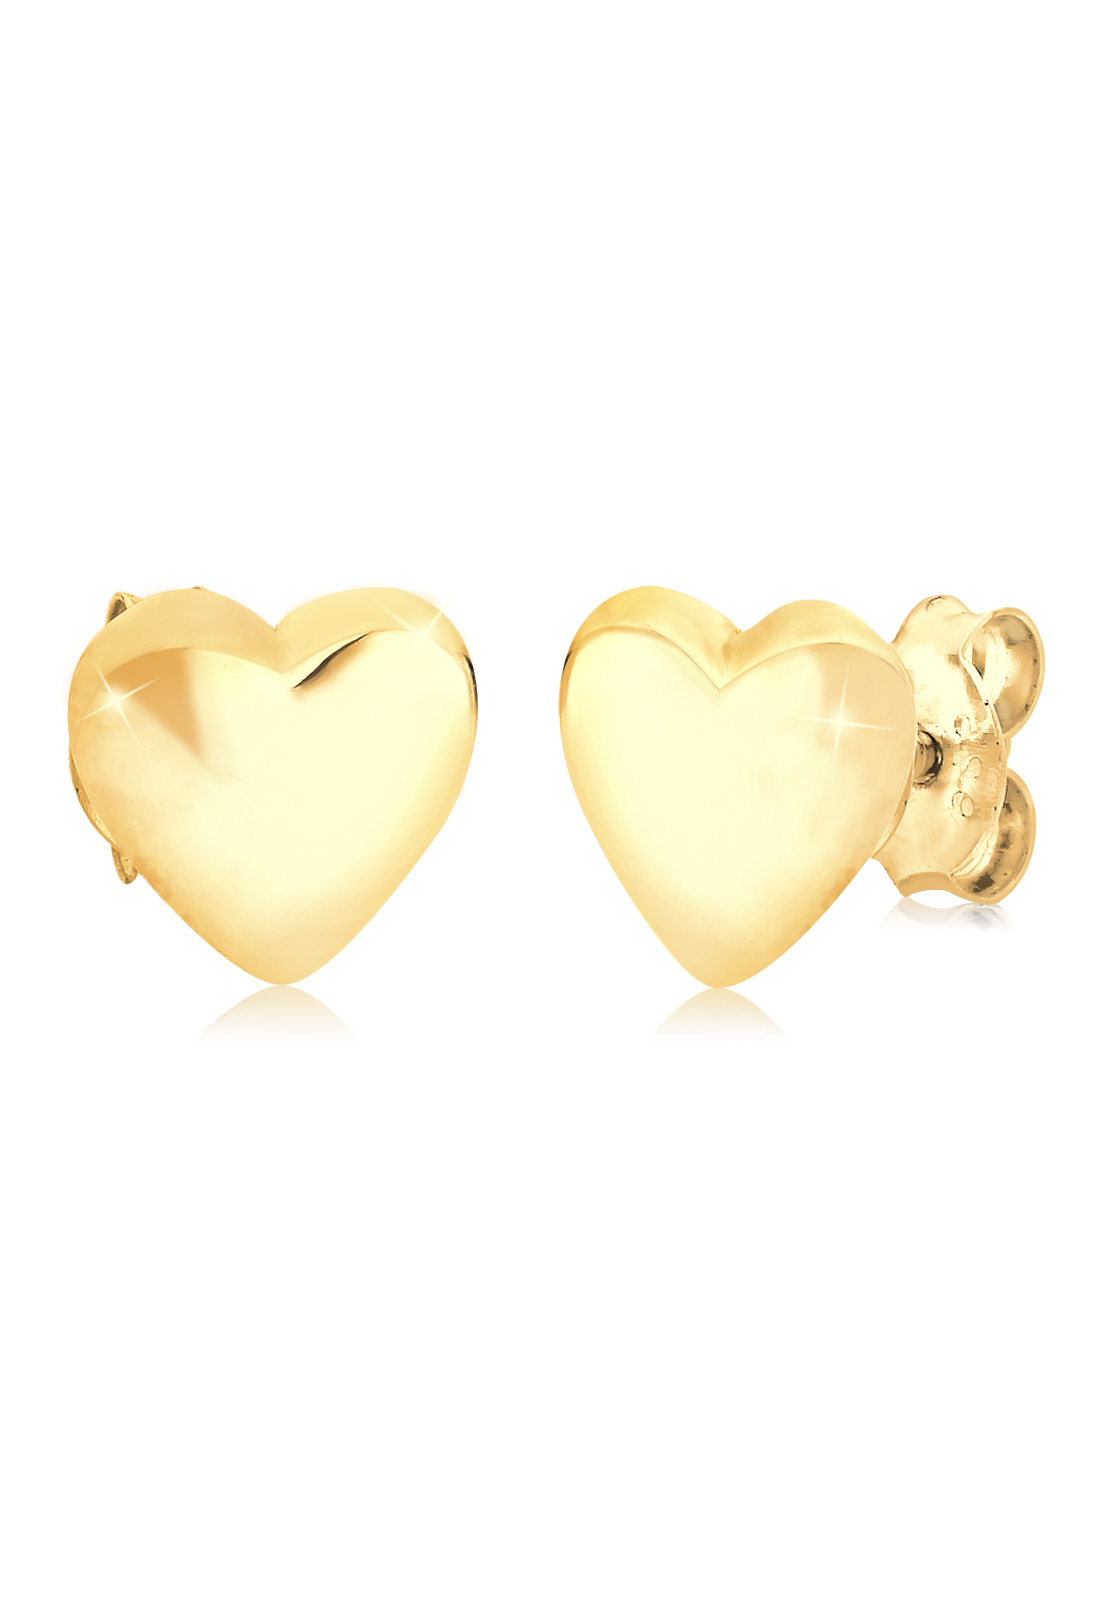 Ohrstecker Herz   925 Sterling Silber vergoldet